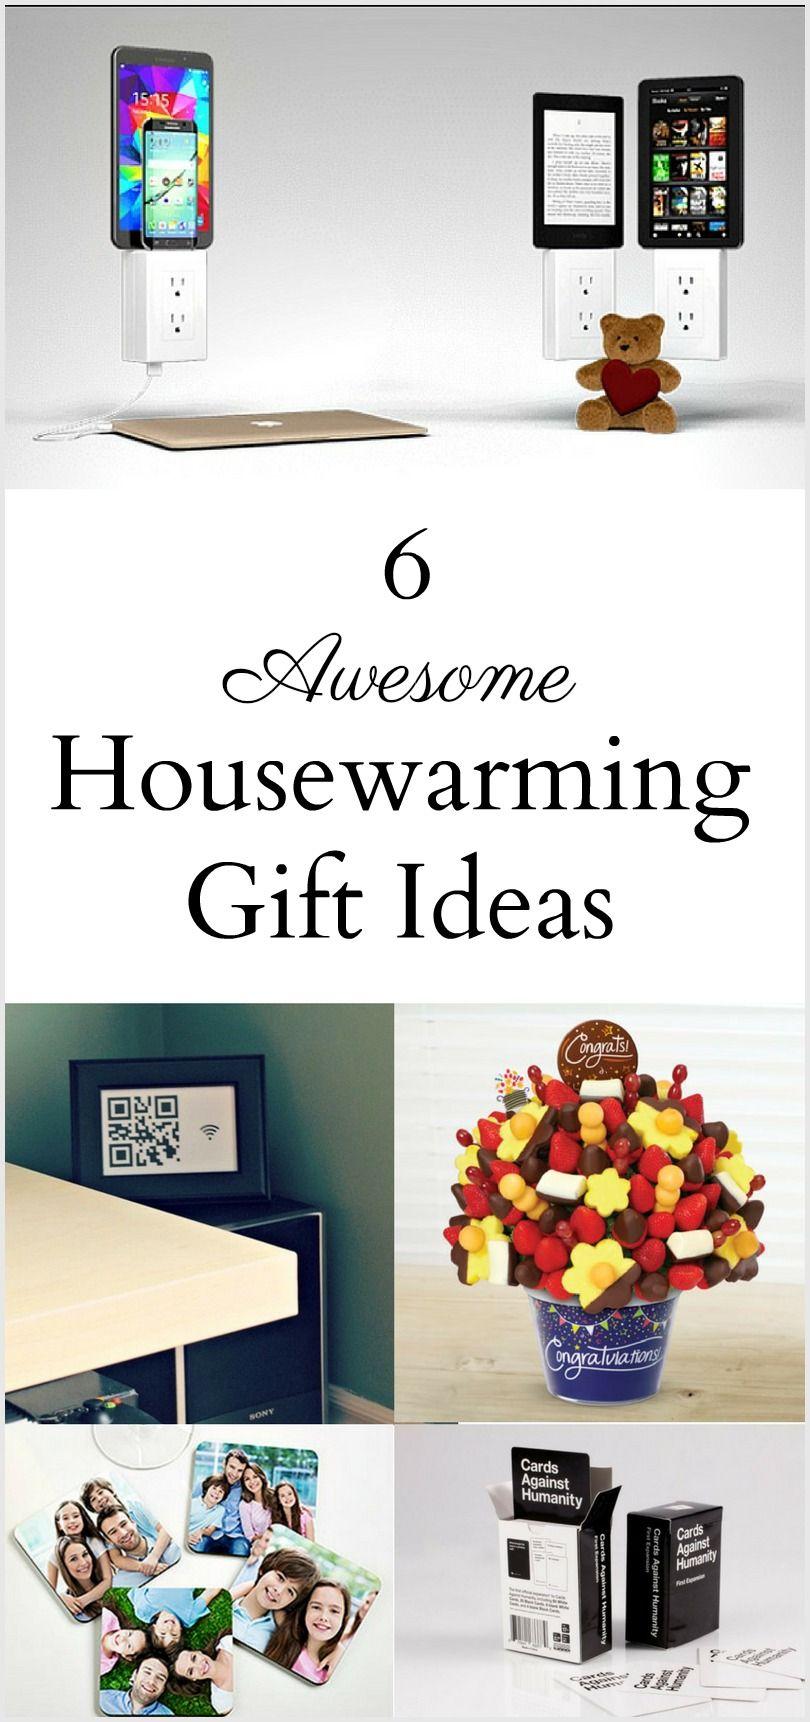 6 Awesome Housewarming Gift Ideas House Warming Housewarming